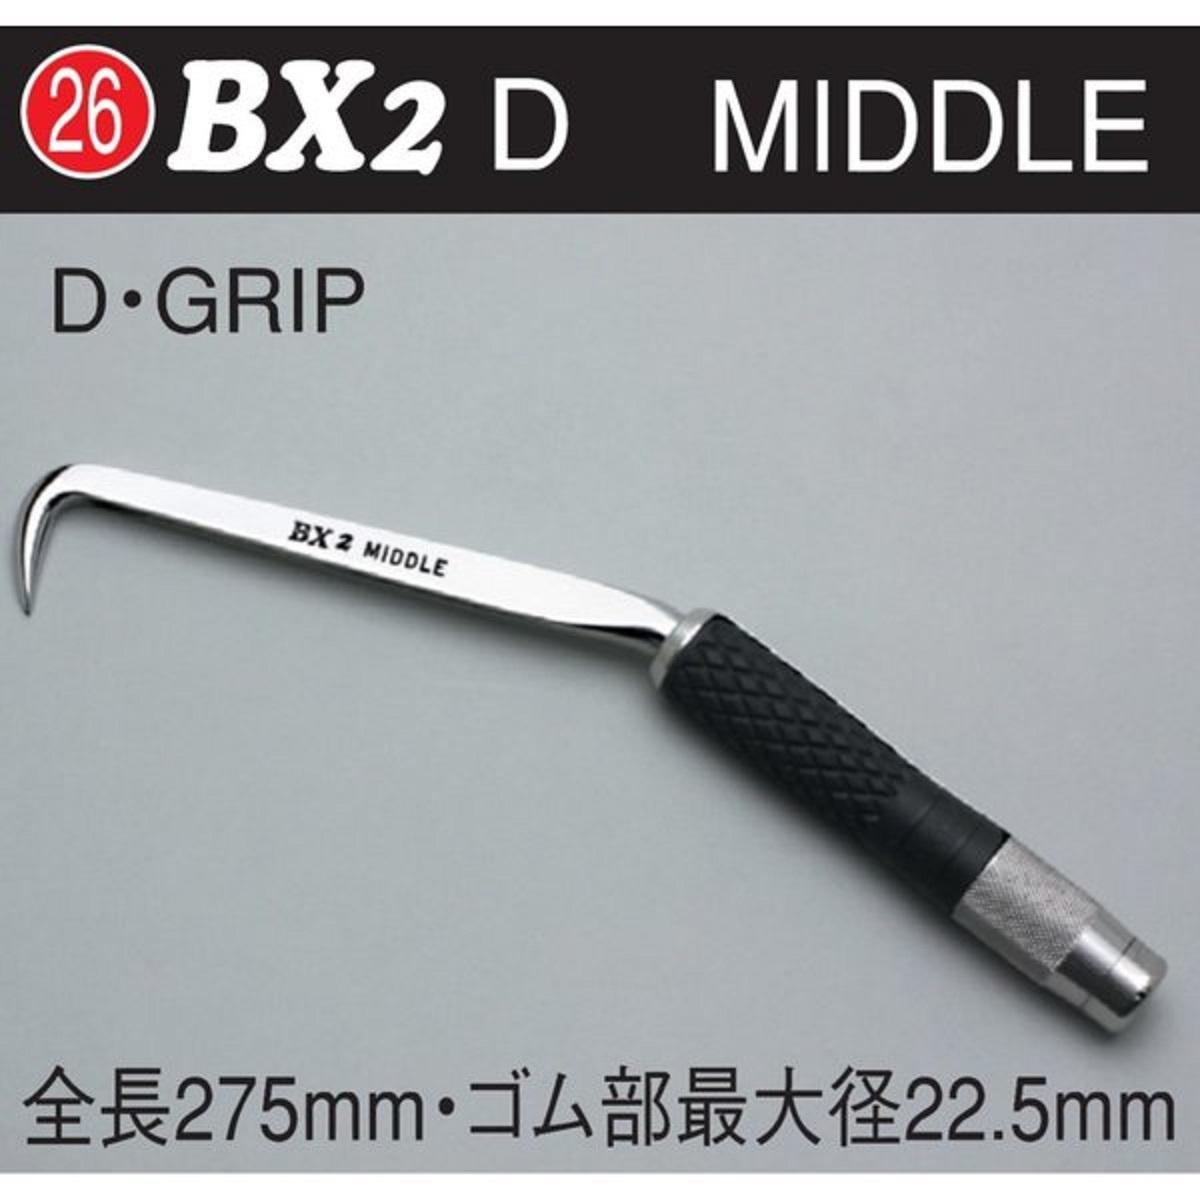 MIKI BX 2 D ハッカー ミドル D グリップ ブラック 黒 鉄筋用作業工具 結束線 ブランド ミキ 三貴